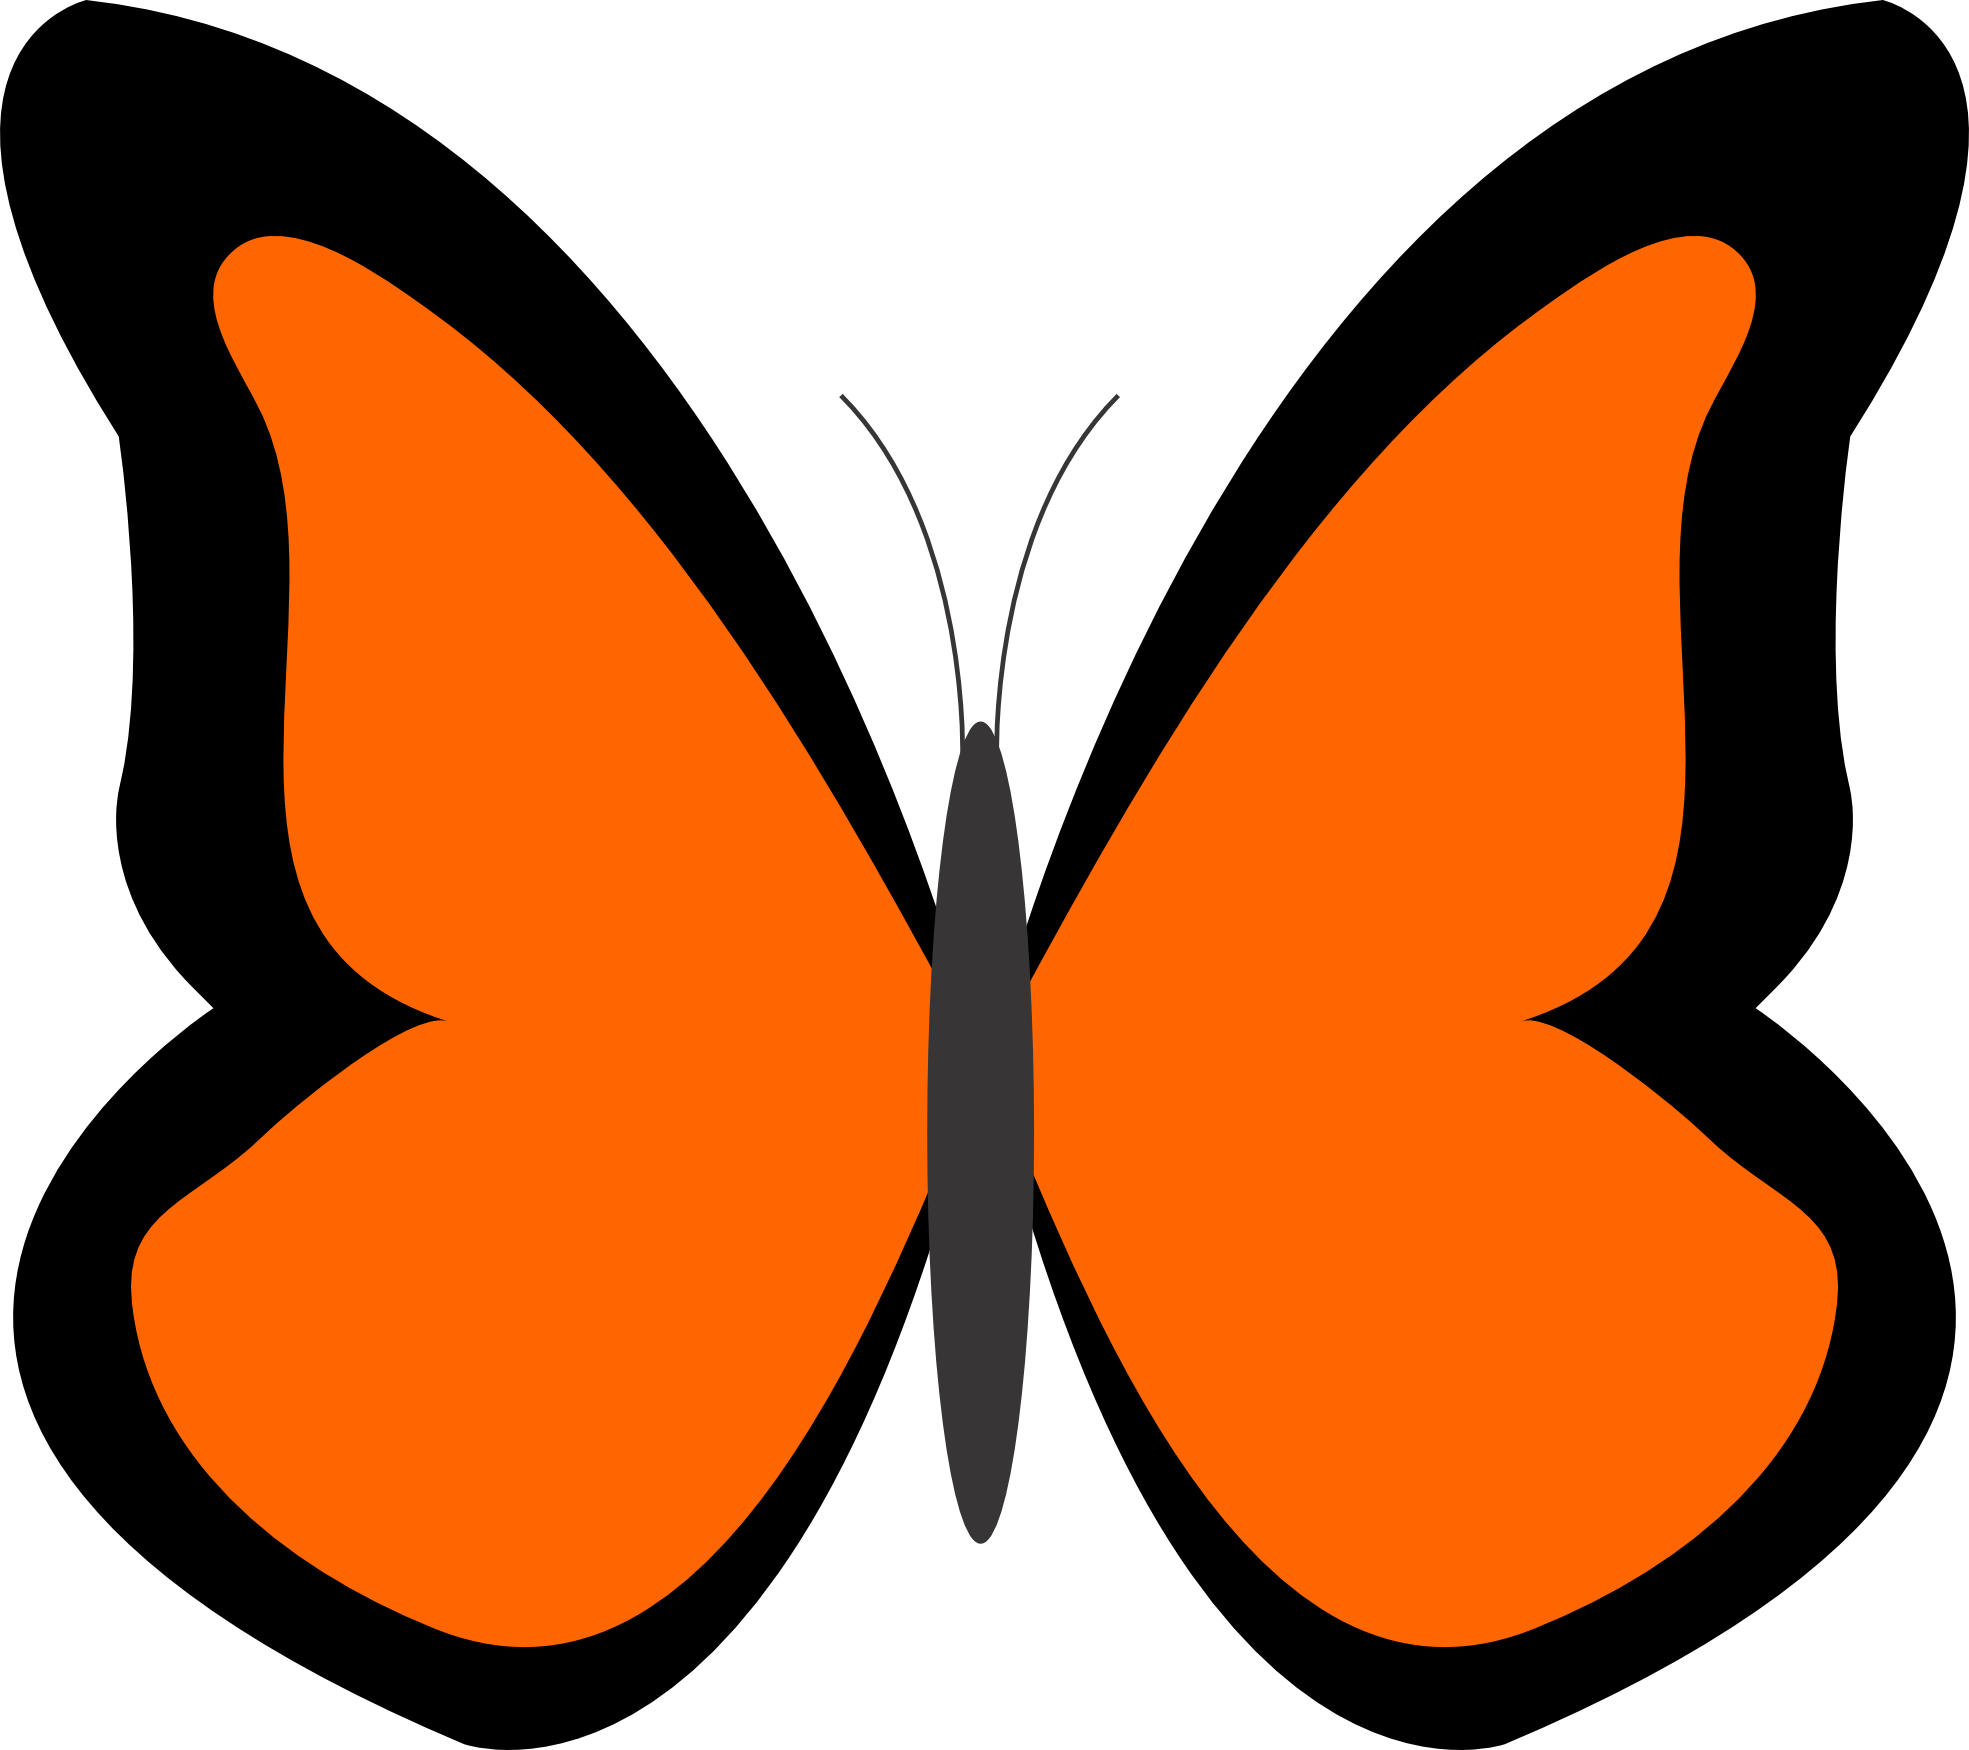 Orange butterfly clipart #8